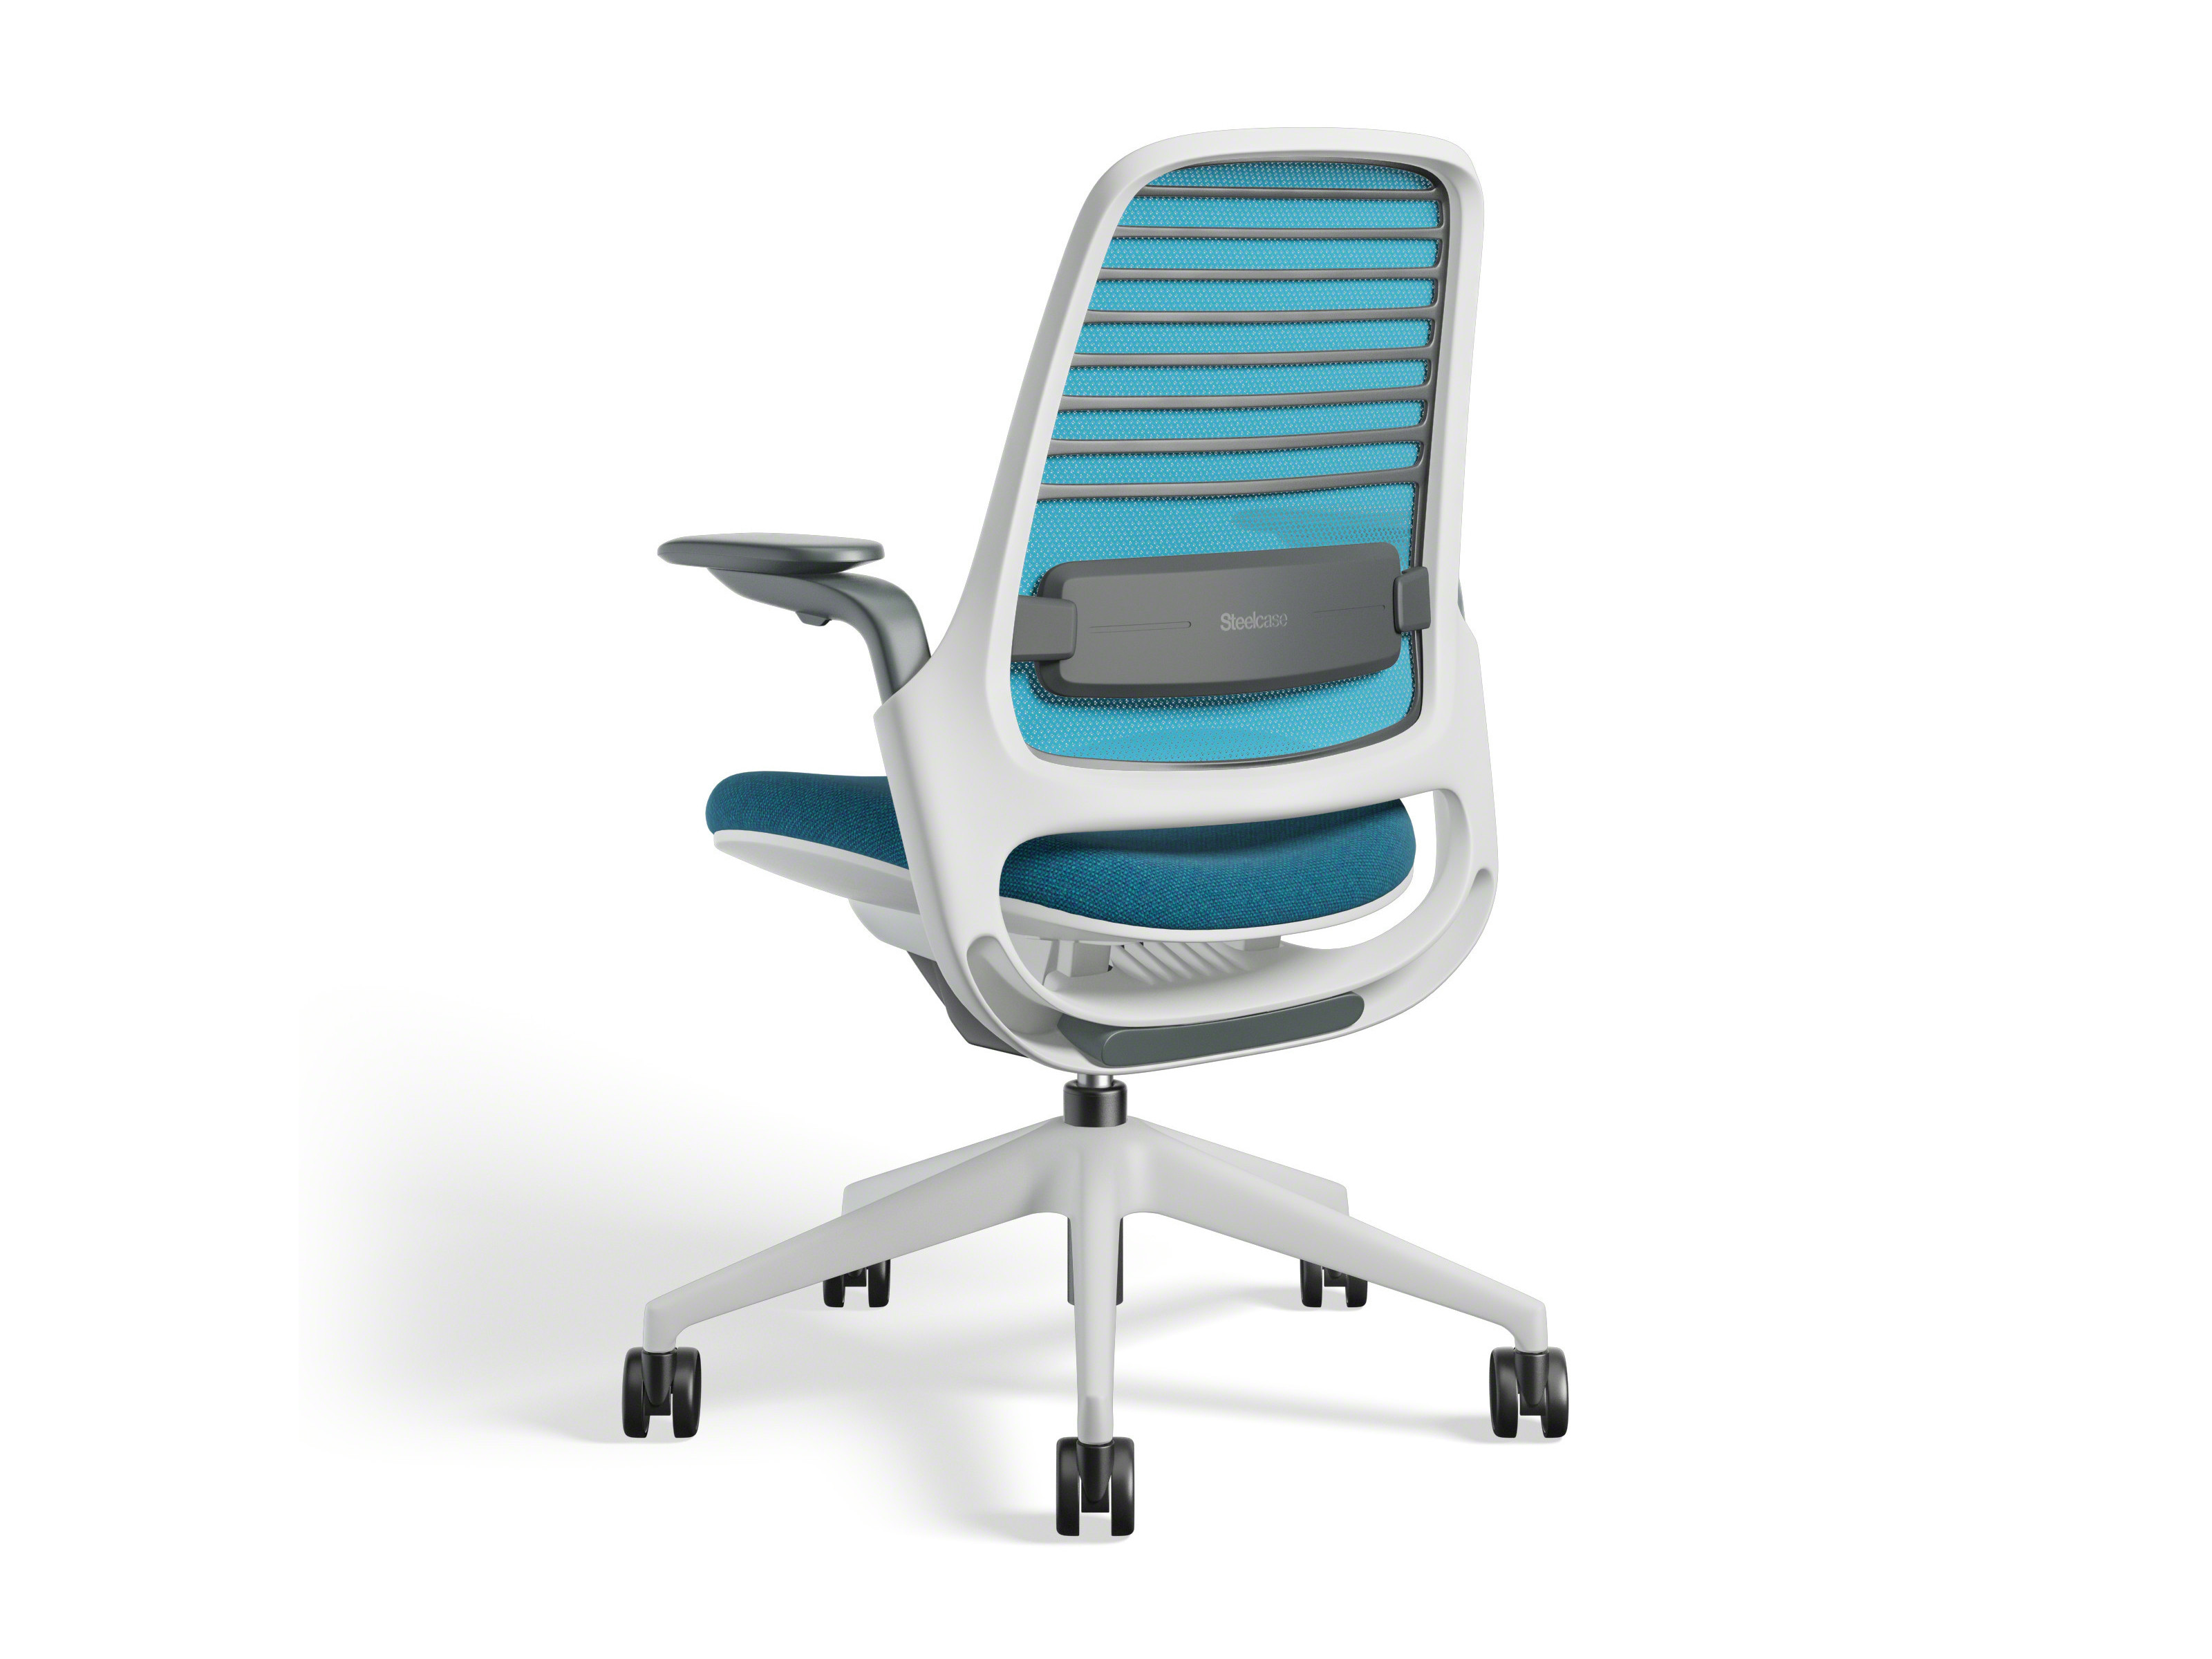 leap chair v2 vs v1 rocking target media steelcase